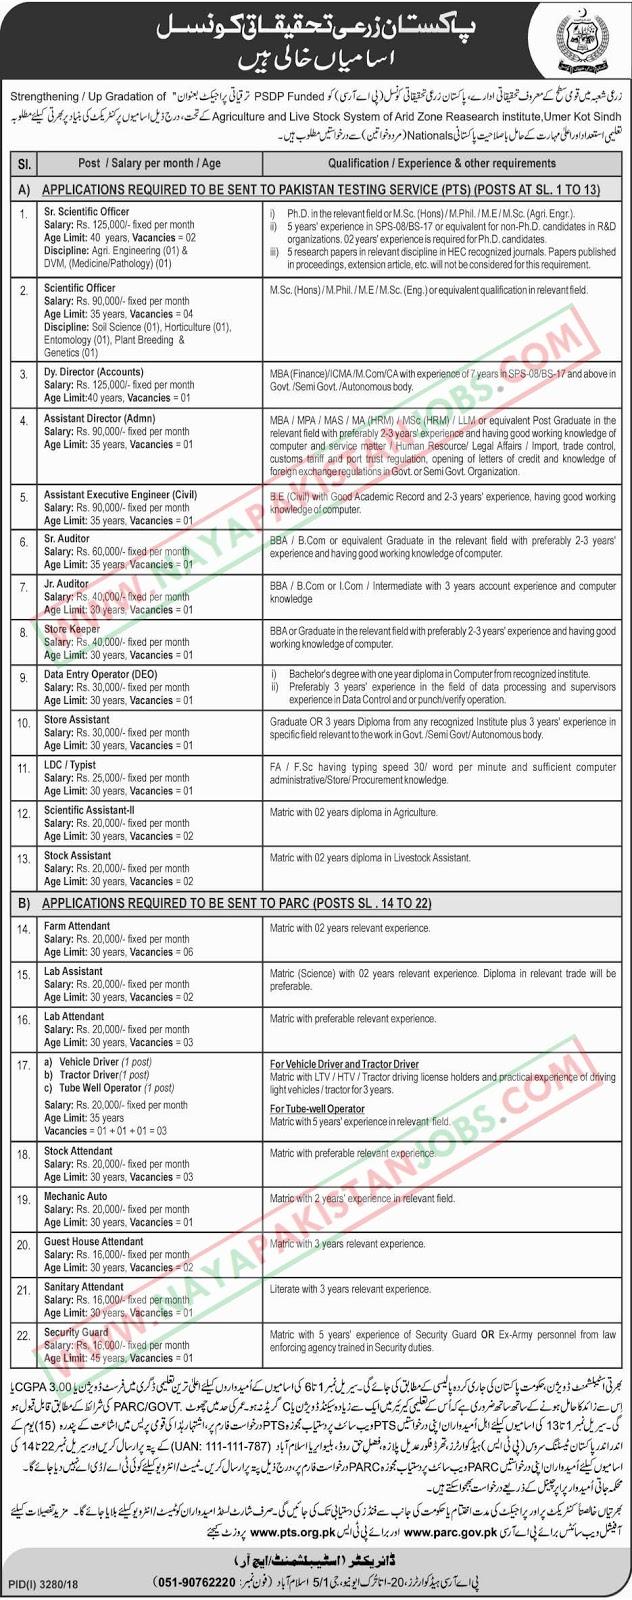 Parc Jobs 2019, Pakistan Agriculture Research Council Jobs Jan 2019 PTS Application Form